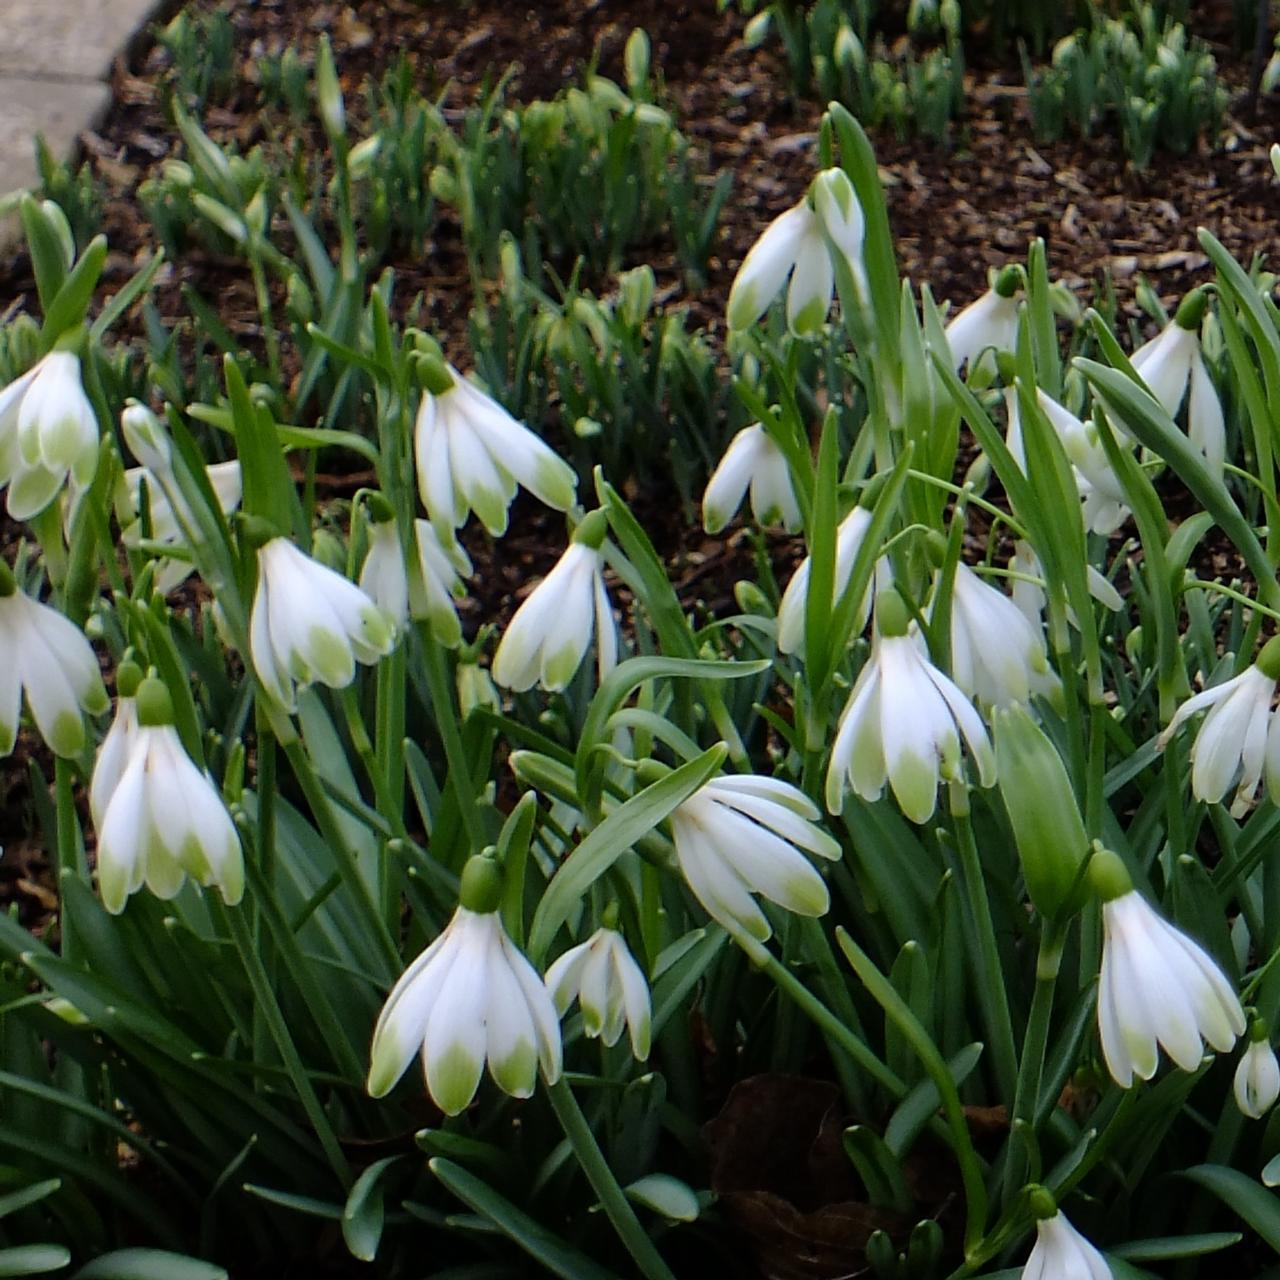 Galanthus 'Wifi Schampagne' plant